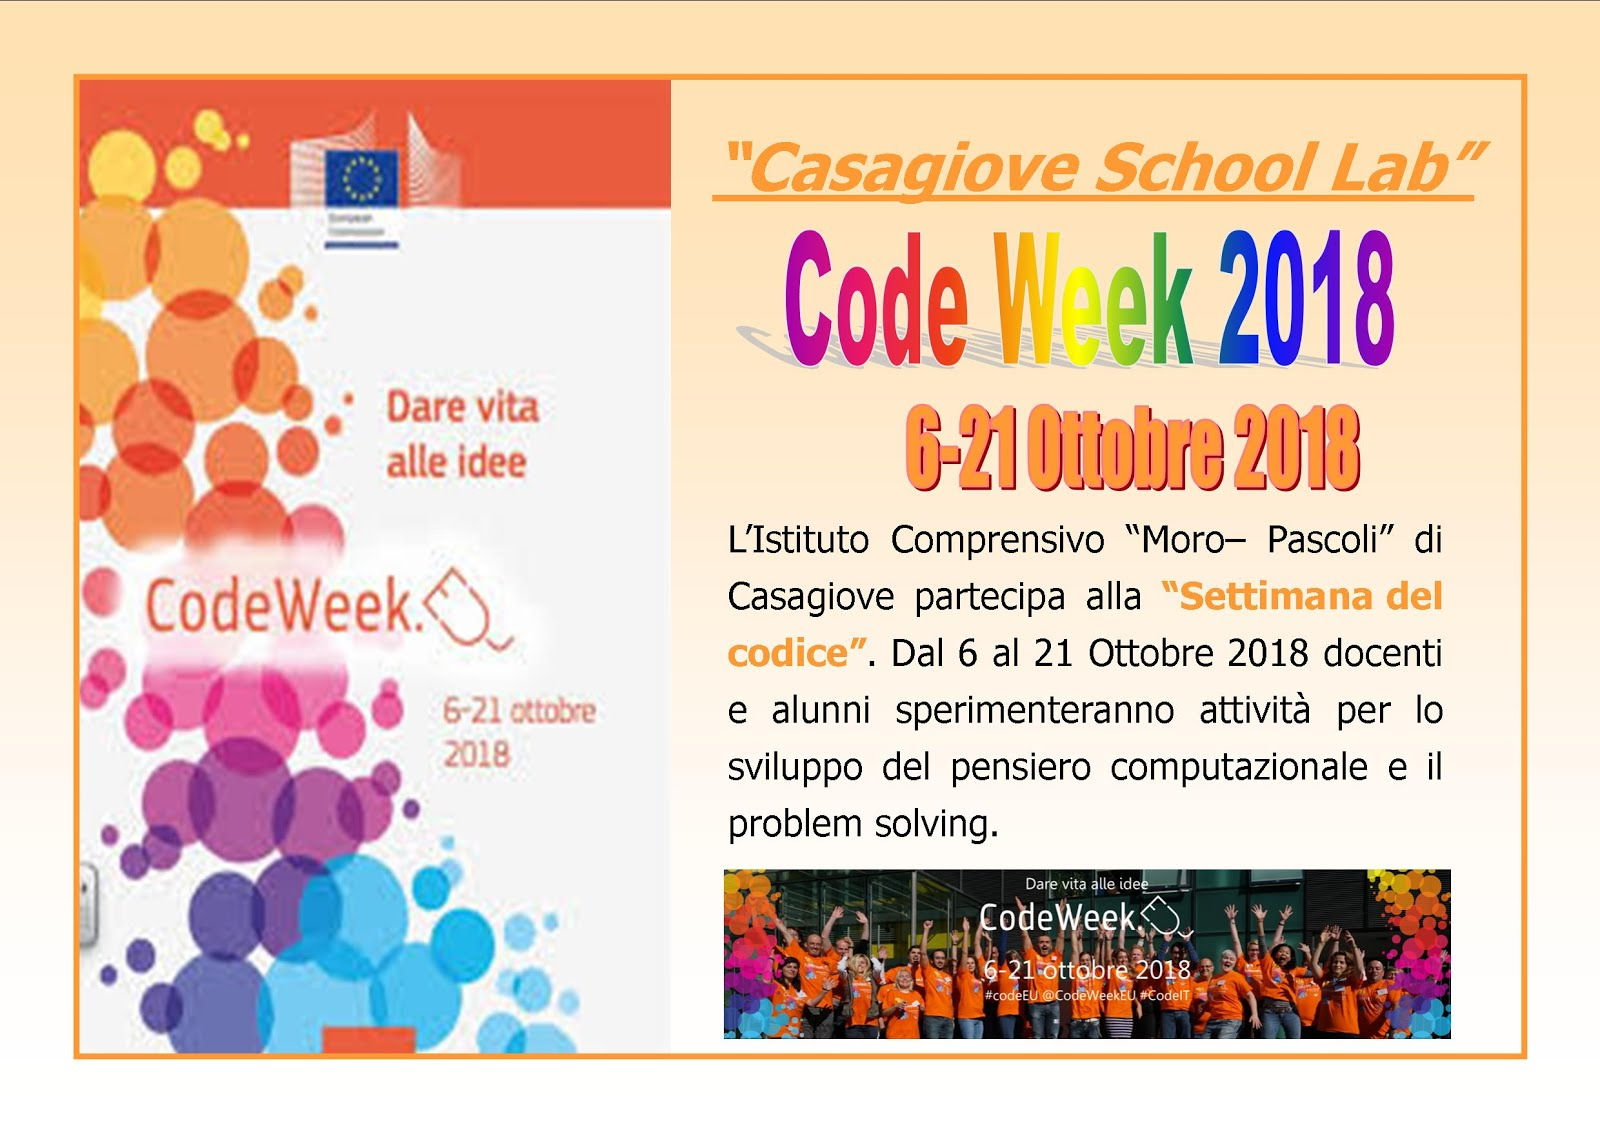 Casagiove School Lab- Codeweek 2018